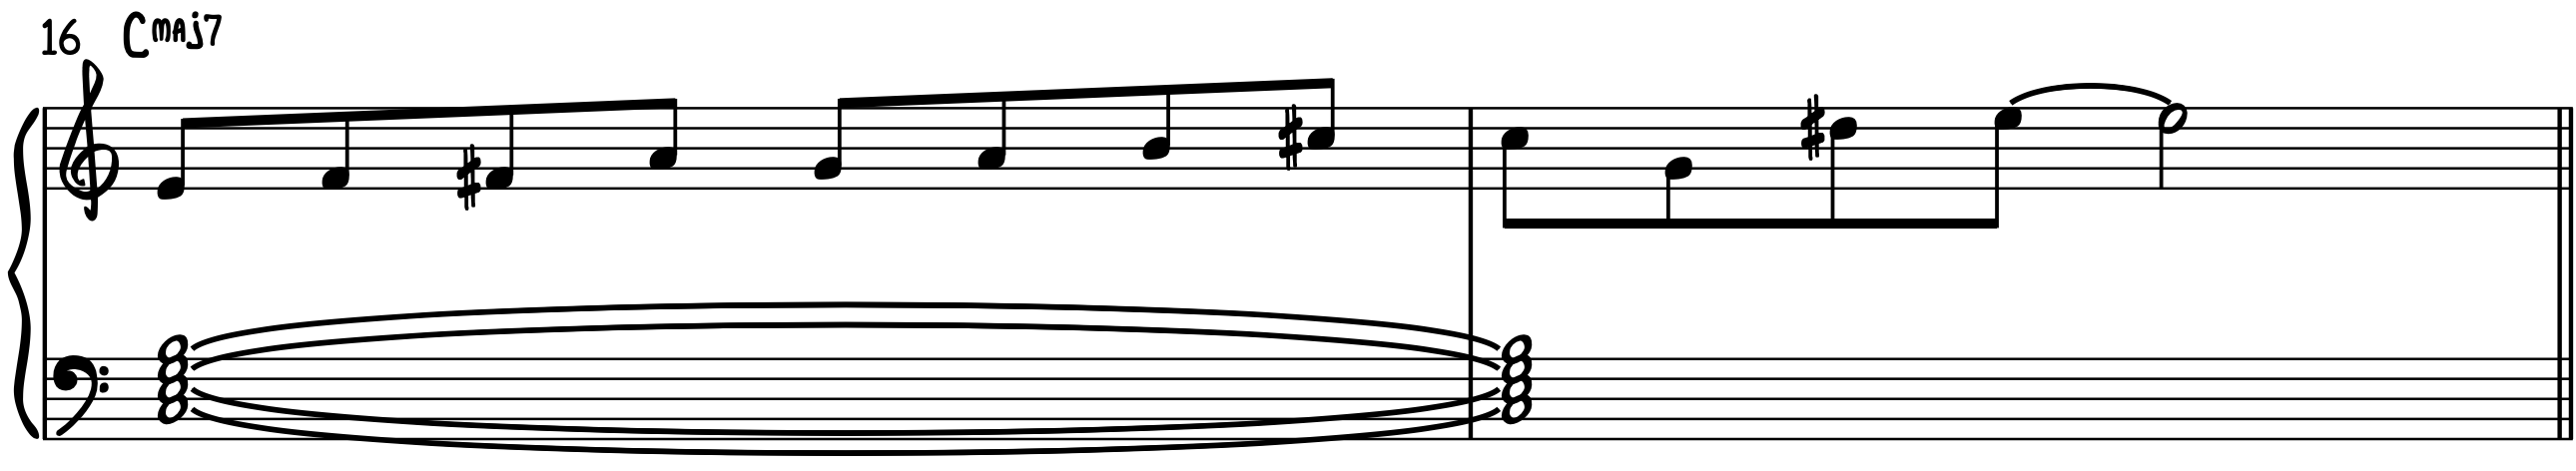 C Major 7 Example Line to play bebop piano